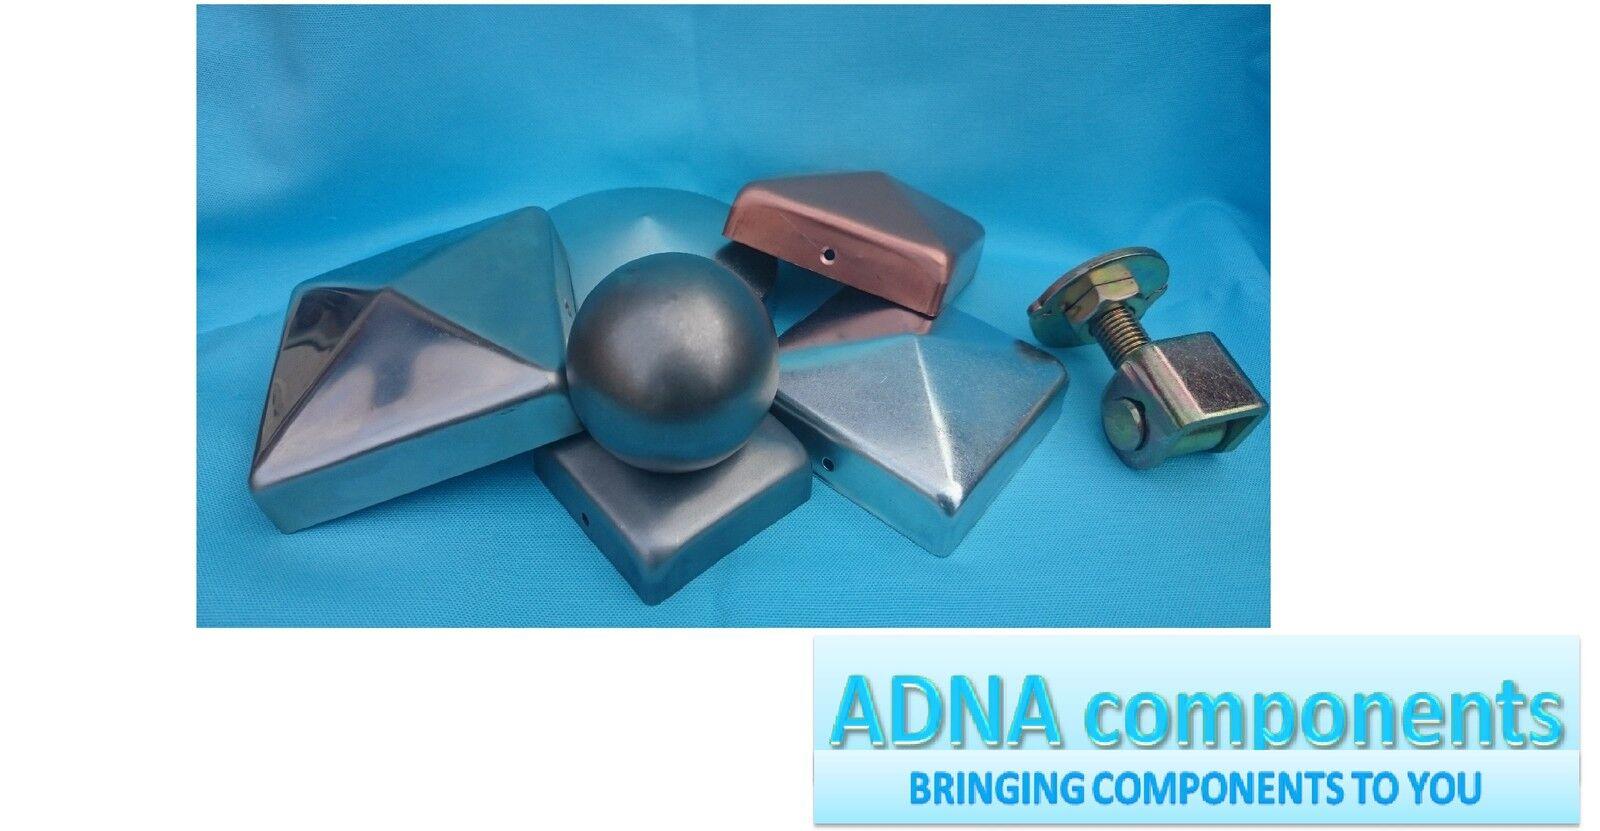 a_d_n_a components